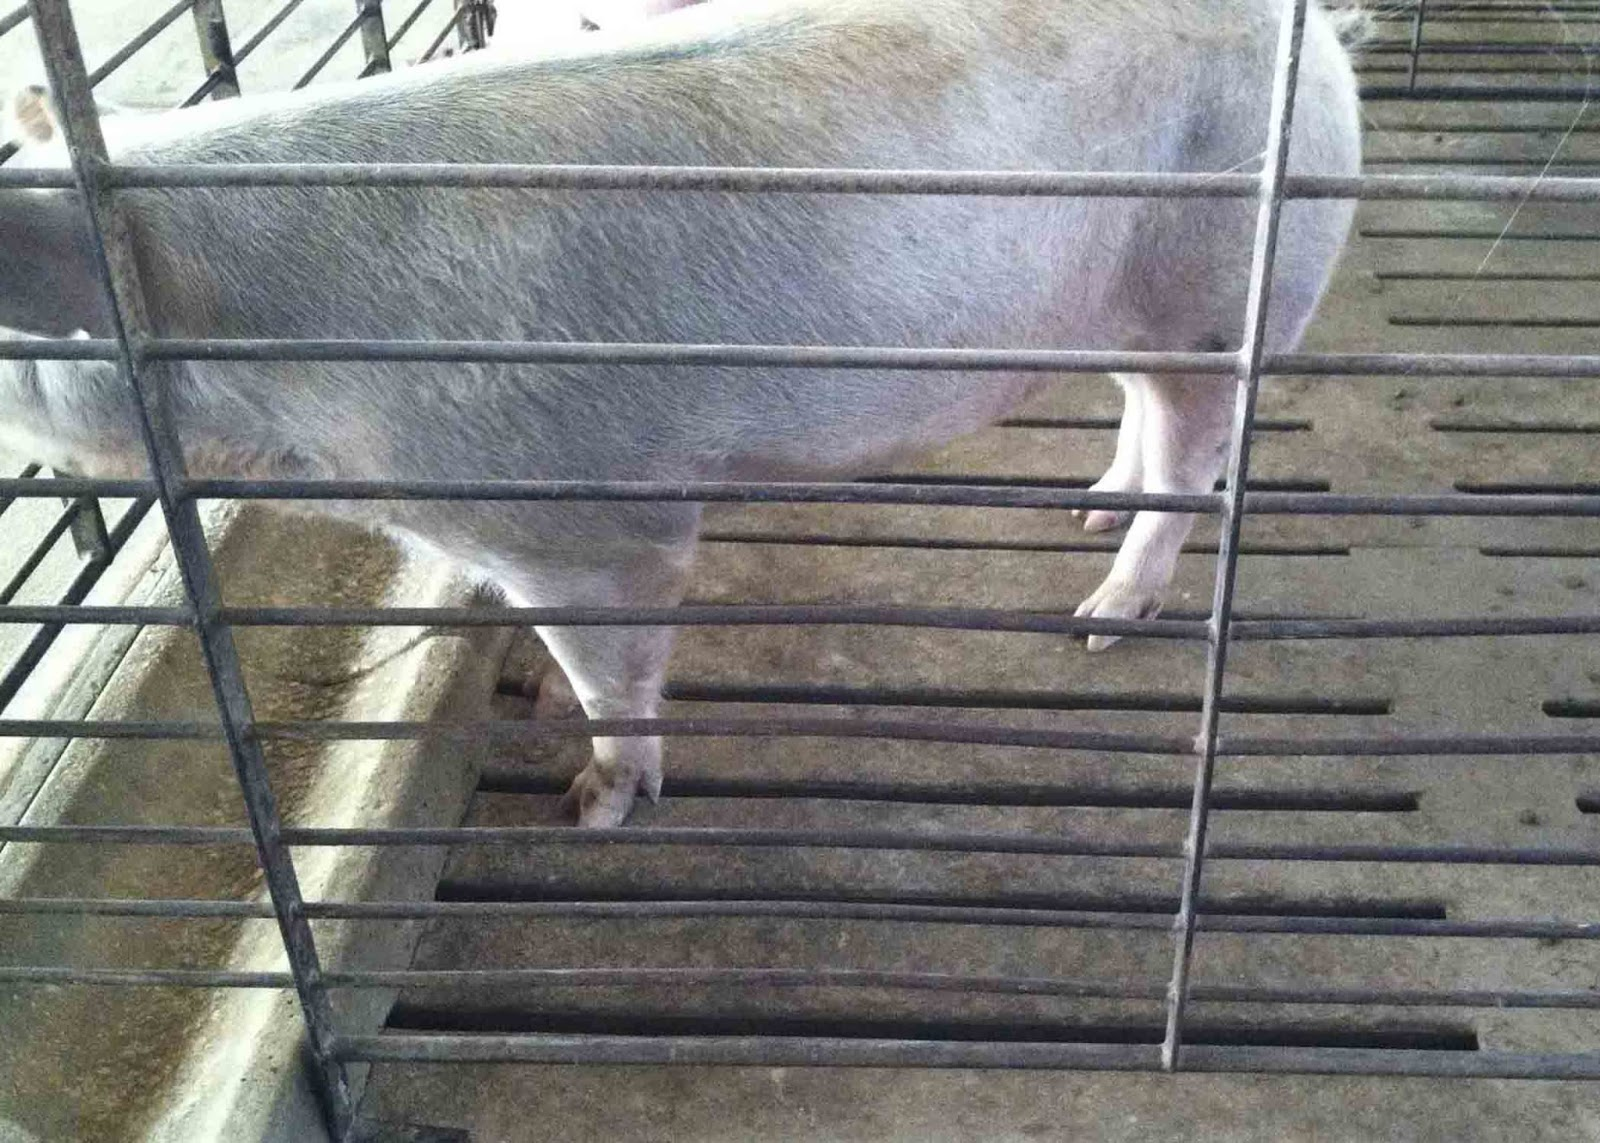 Slatted Floors For Pigs Fair Oaks Farms 26th July 2014